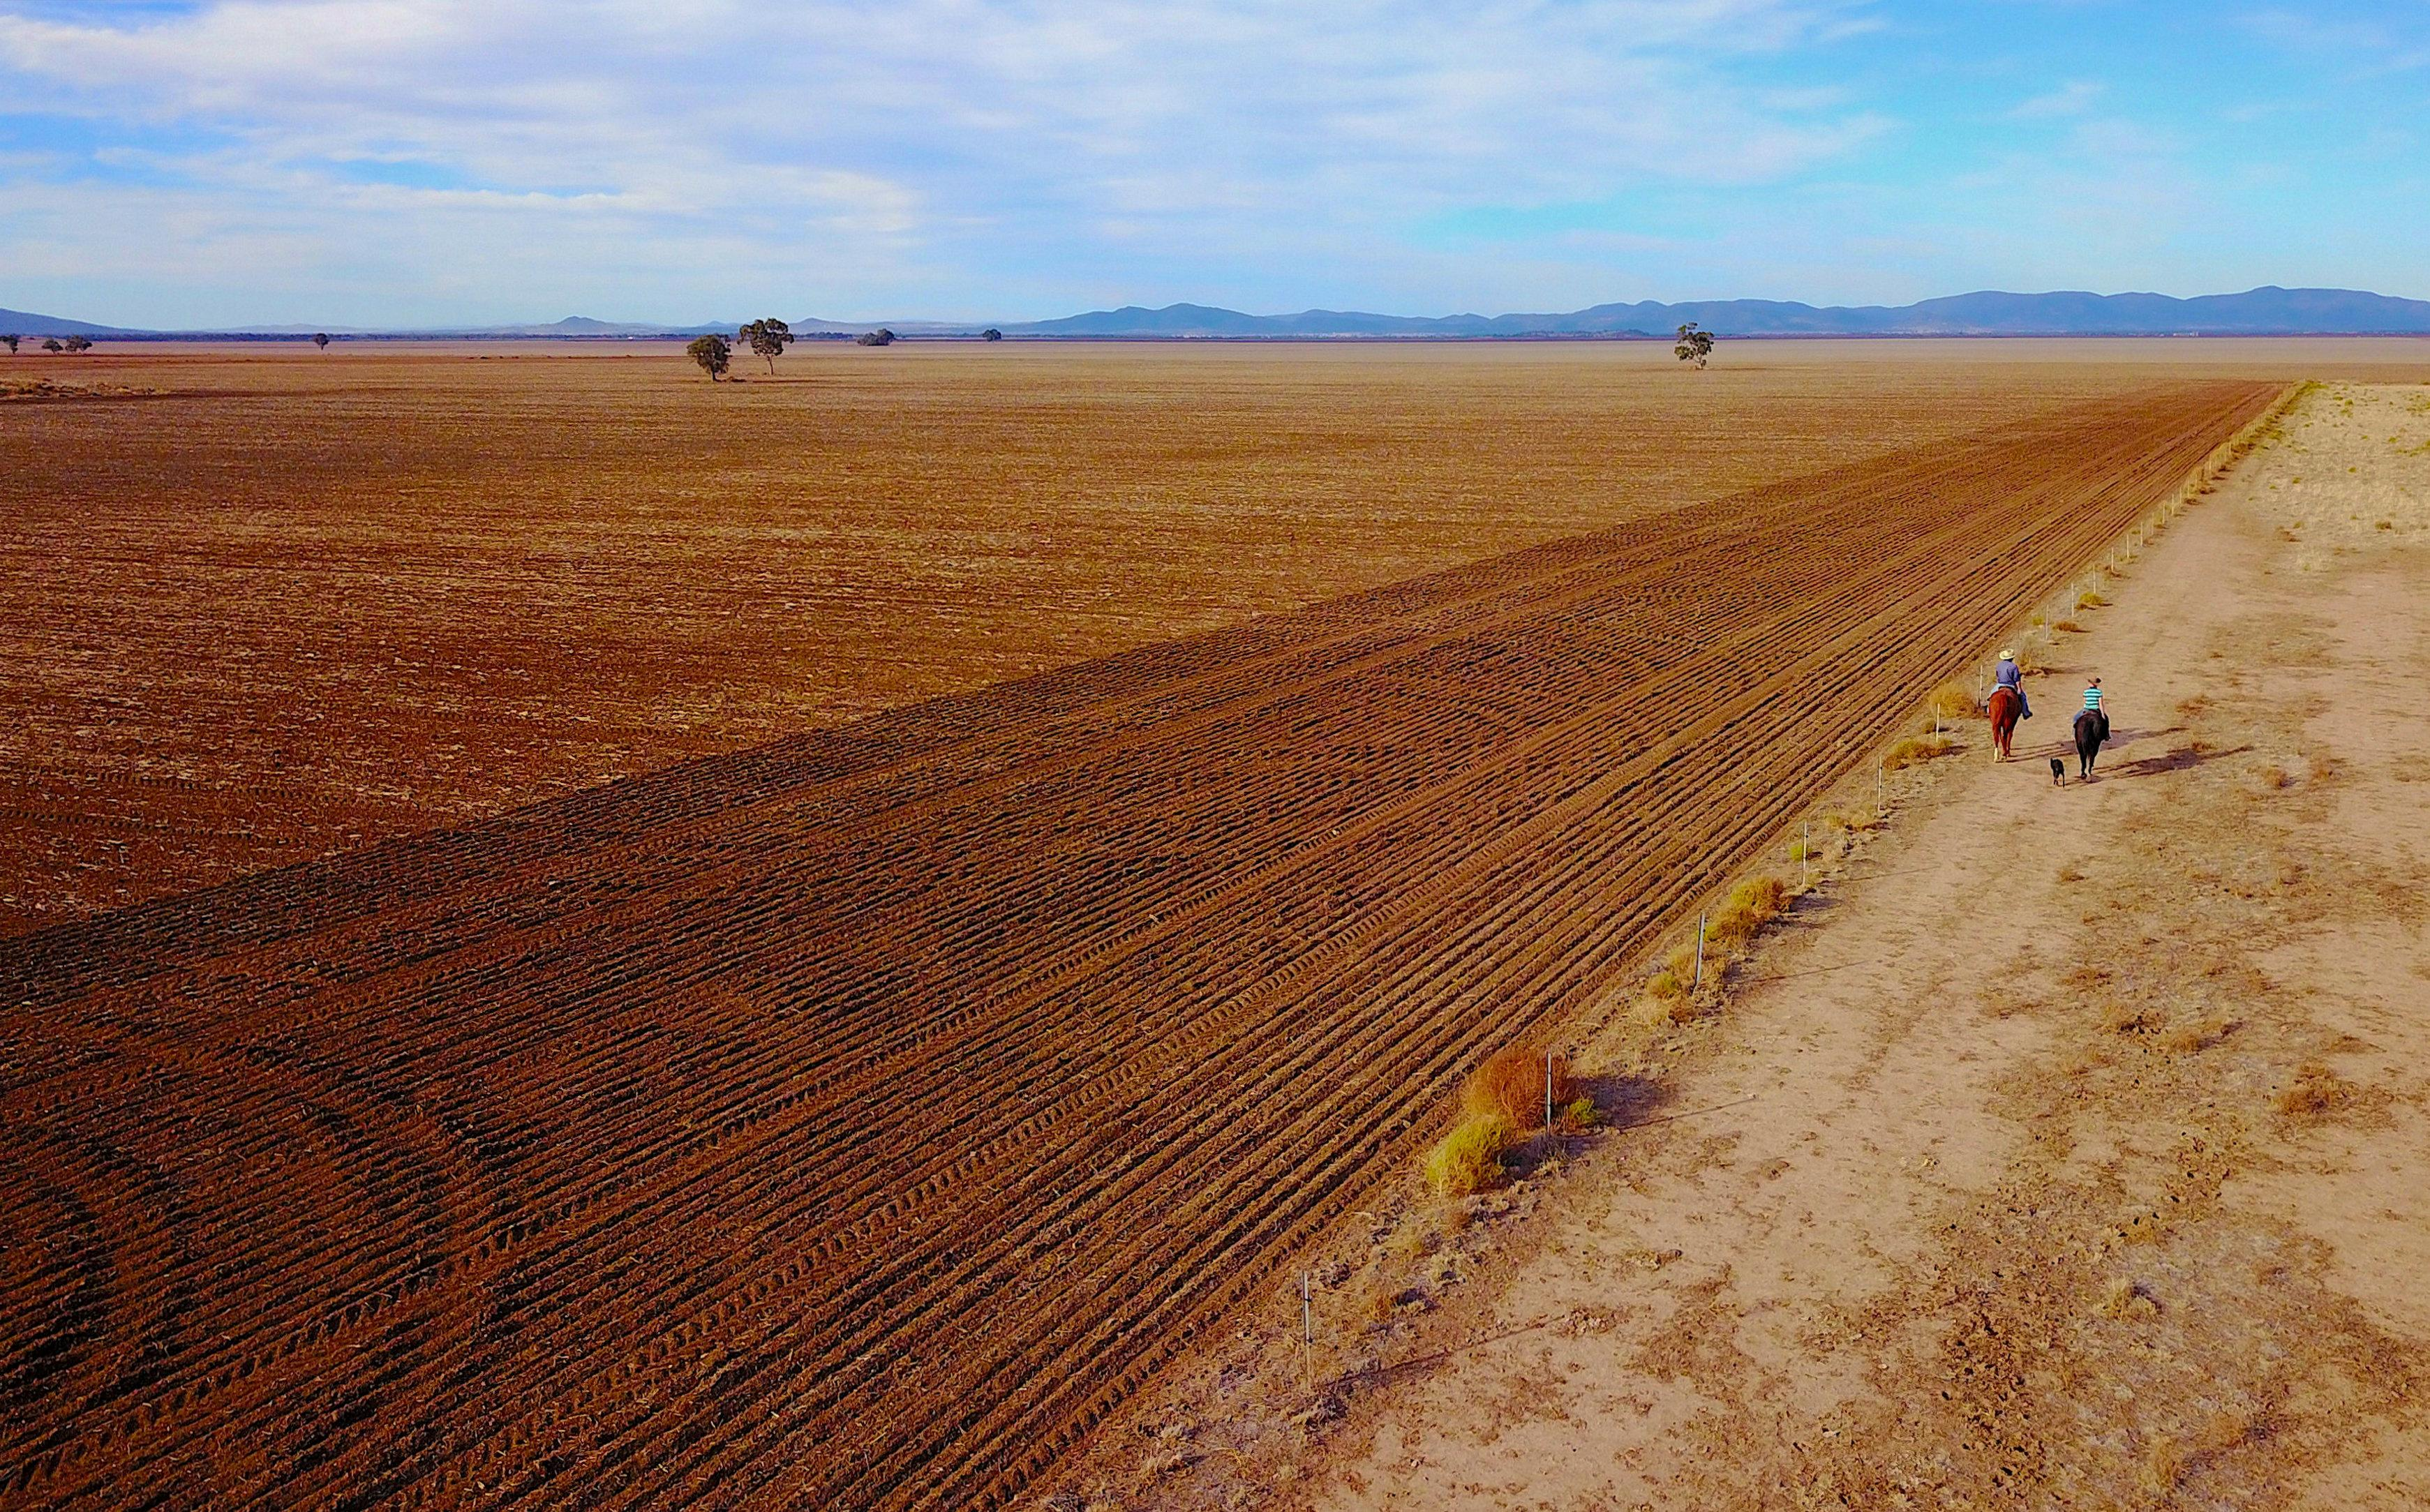 Column: Drought vaporizes Australia's share of global wheat exports